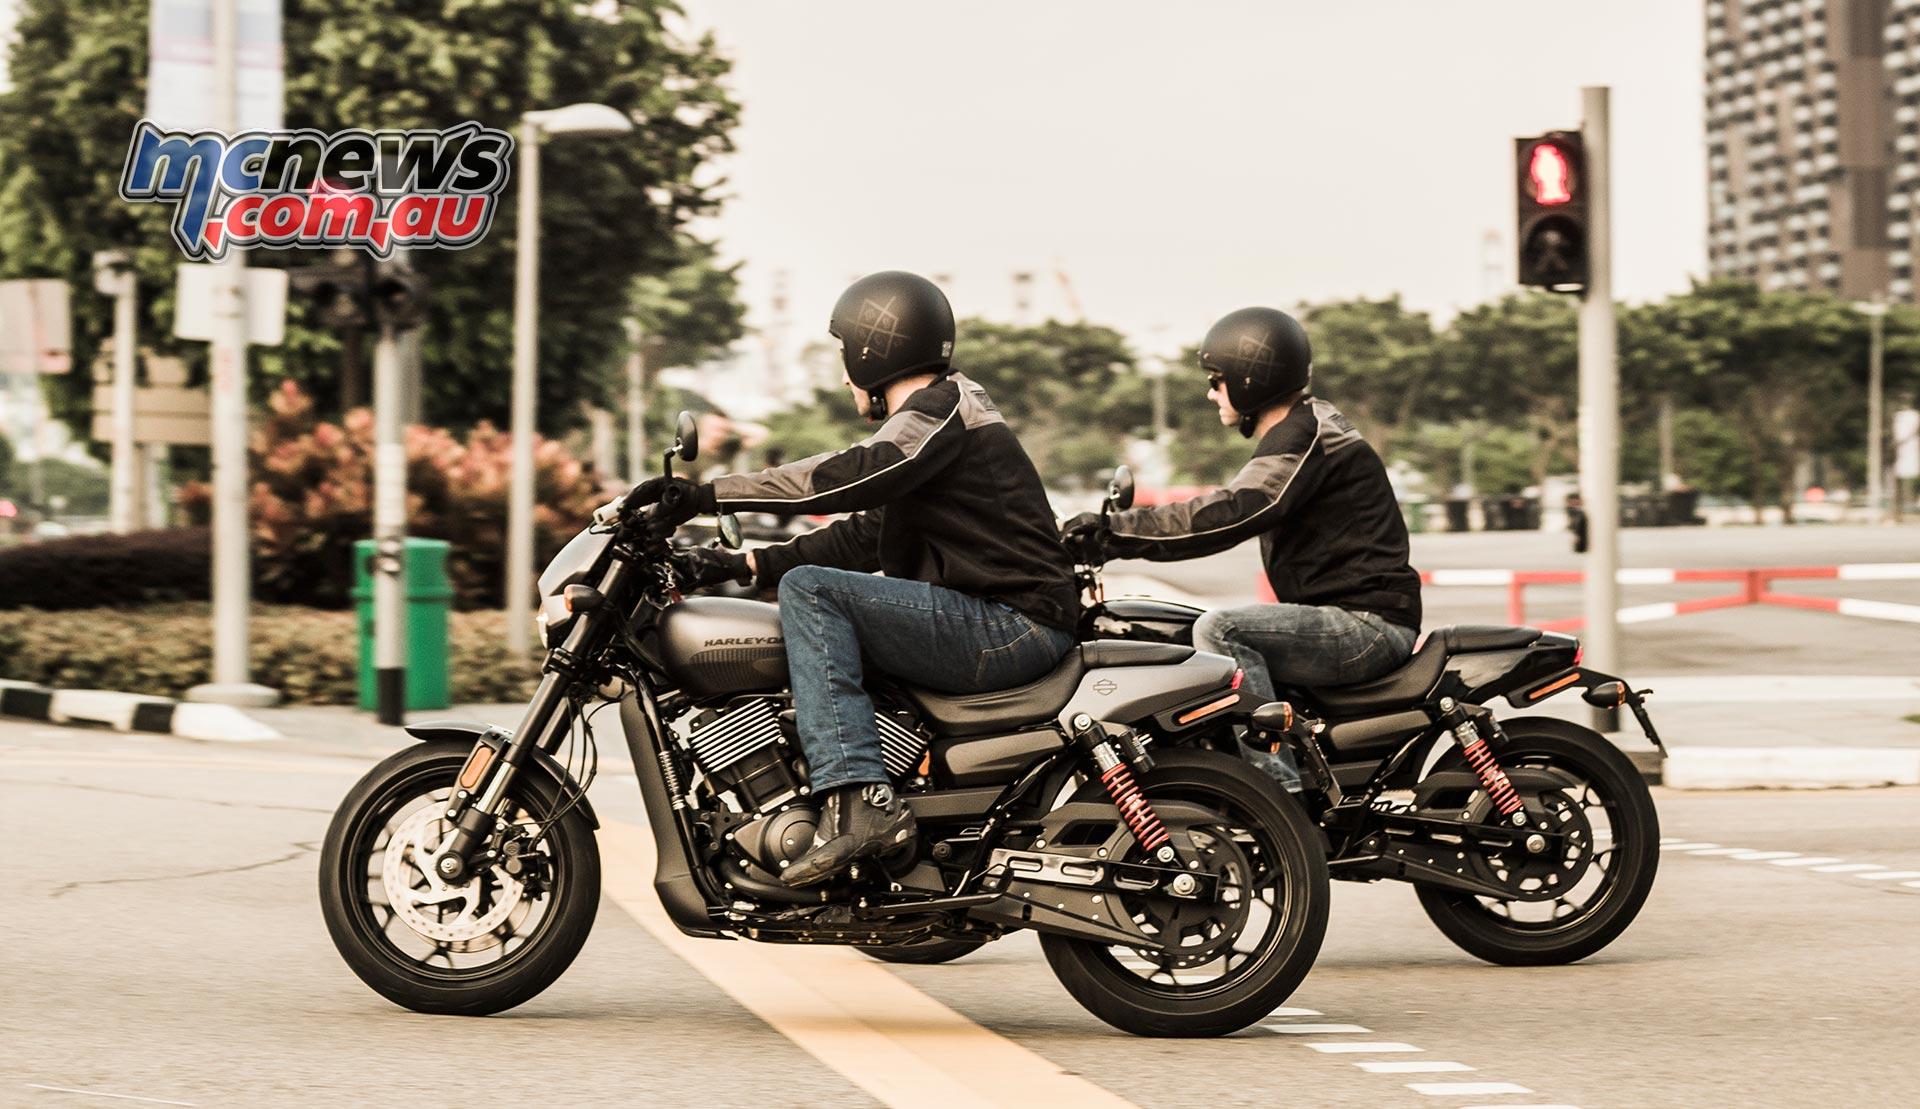 Harley Davidson Street Rod Launch on Sportster Road Test